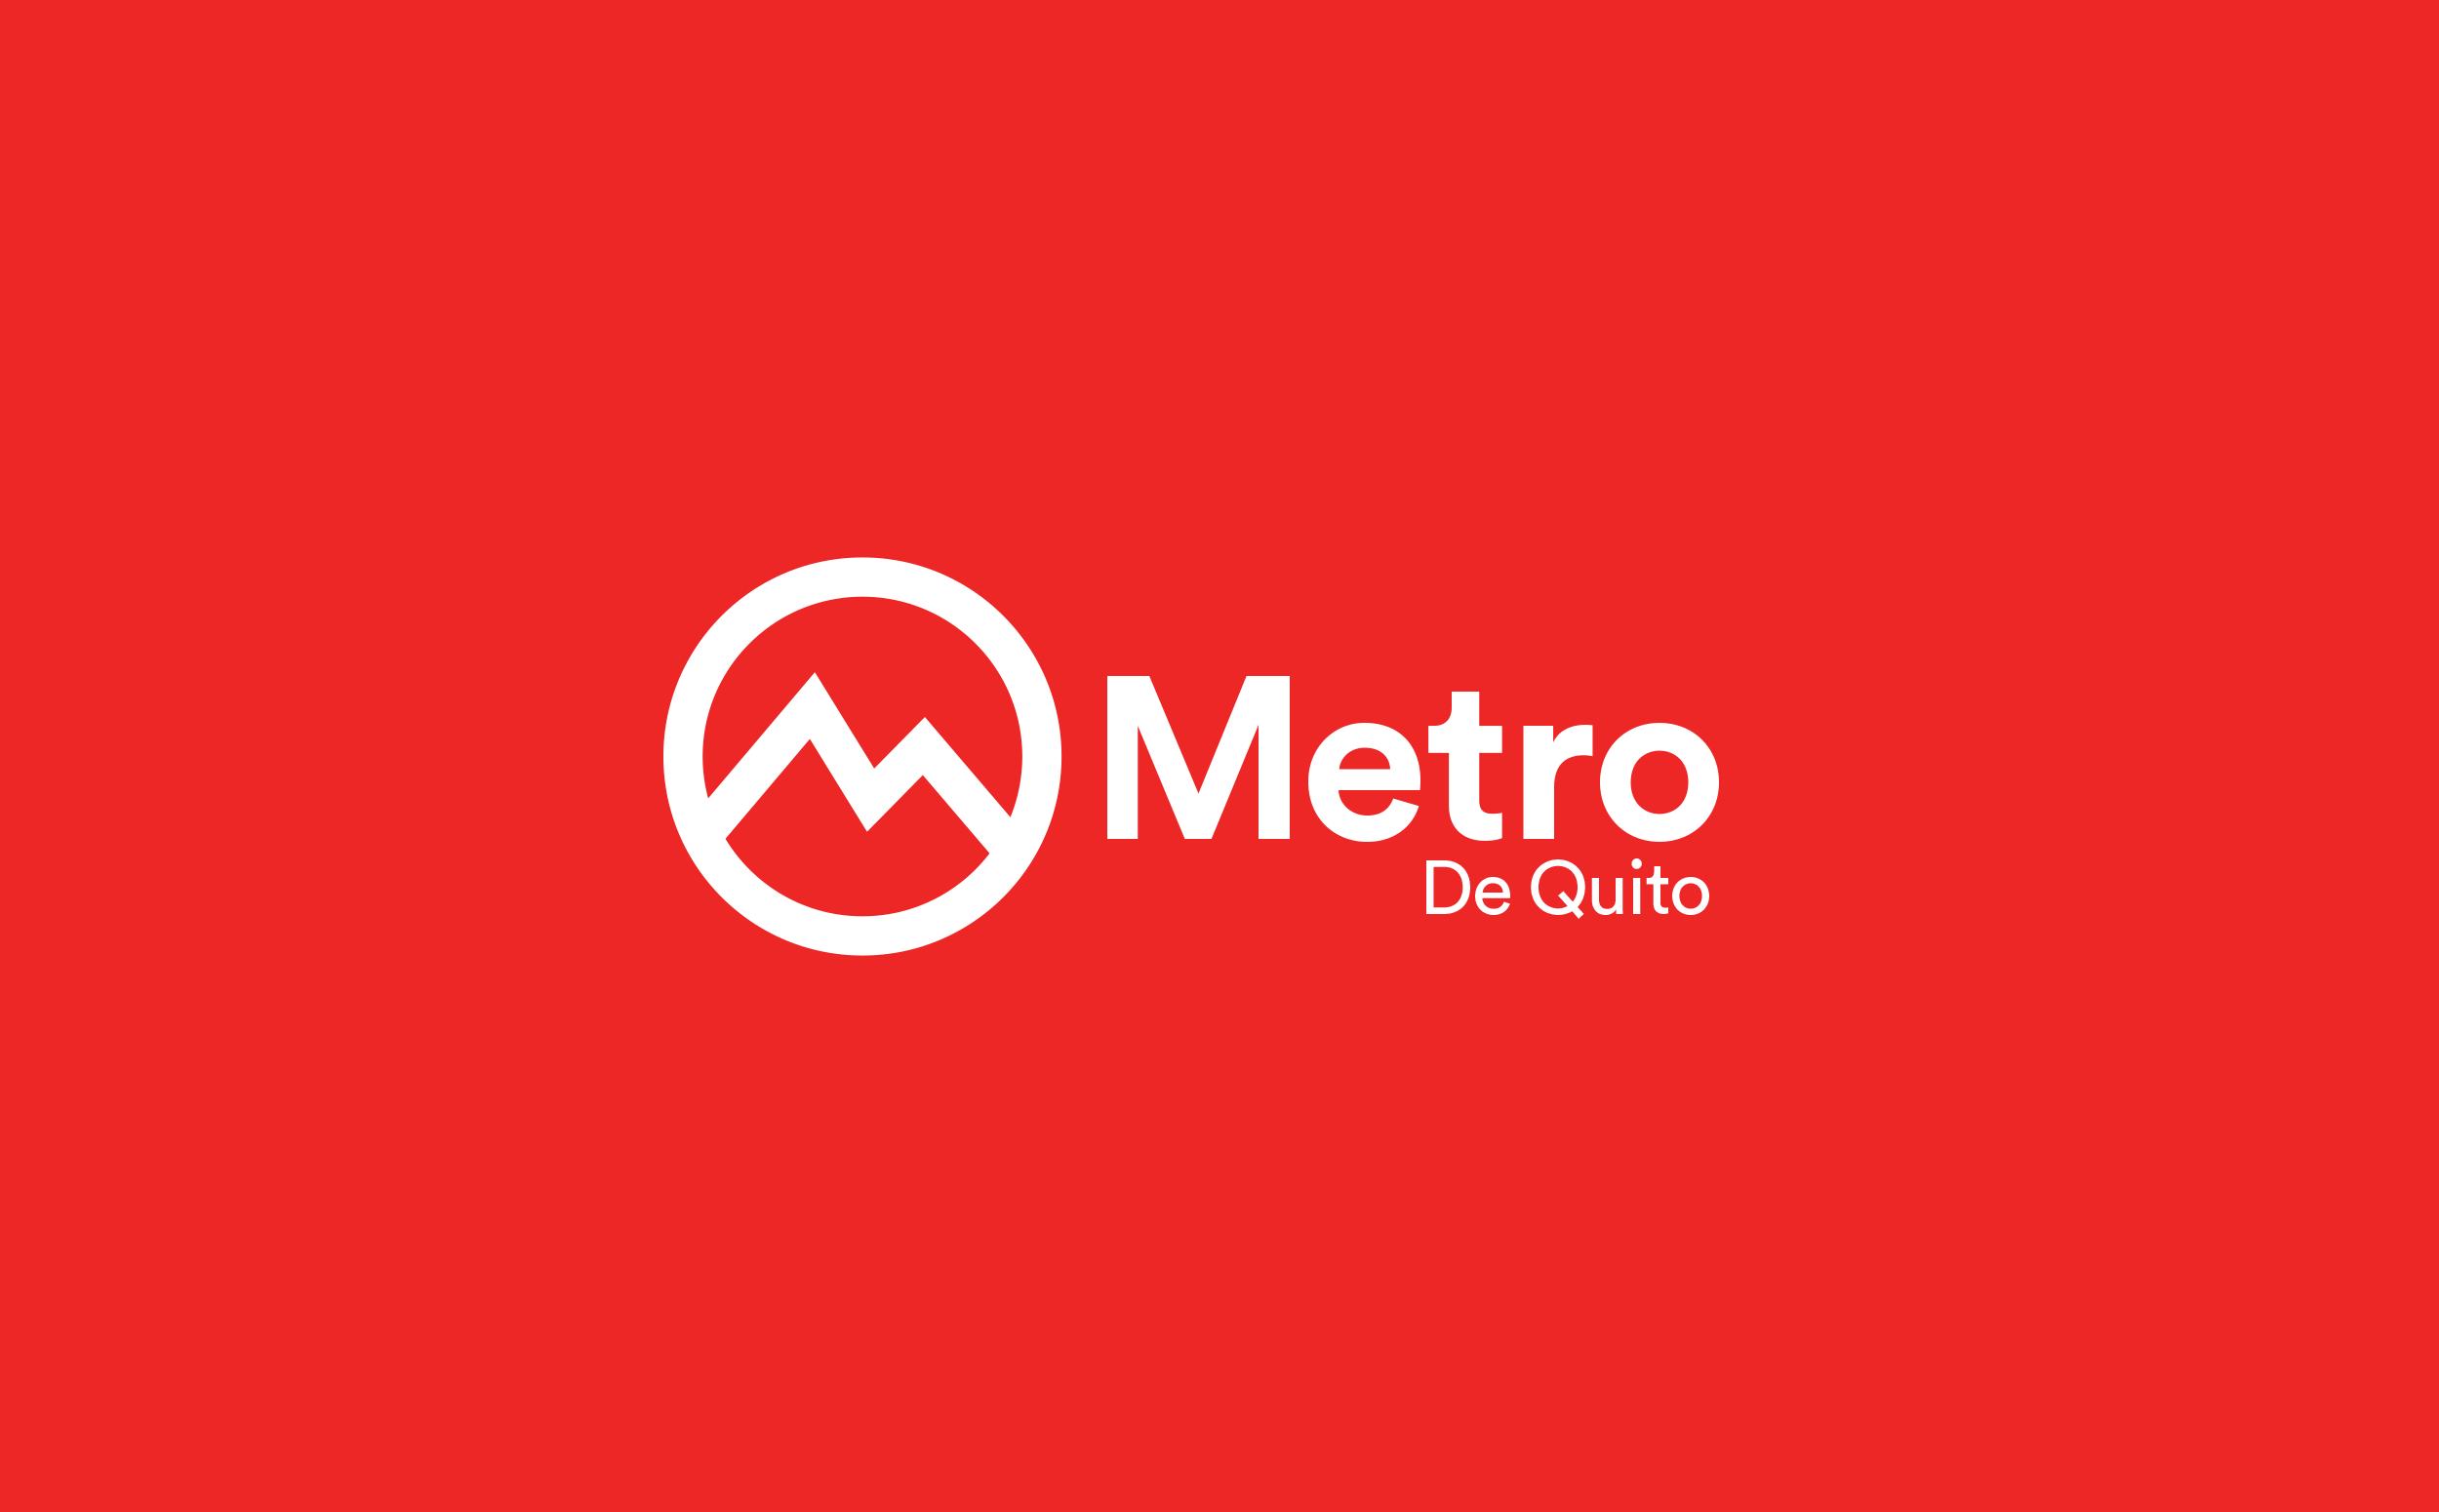 logo2-sobrerojoo-msdq